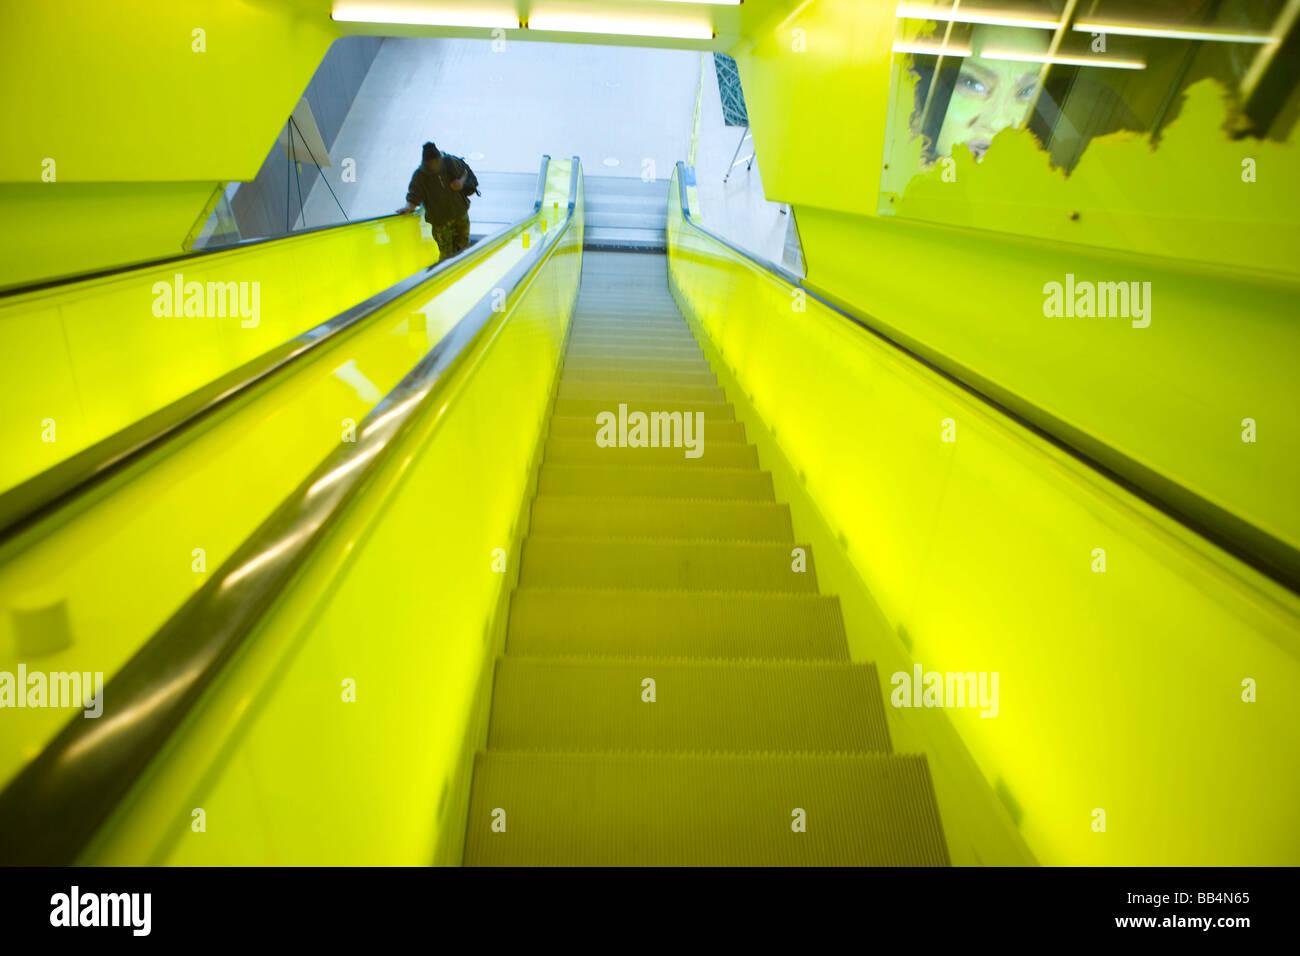 NA, USA, Washington, Seattle, Central Library, escalator - Stock Image